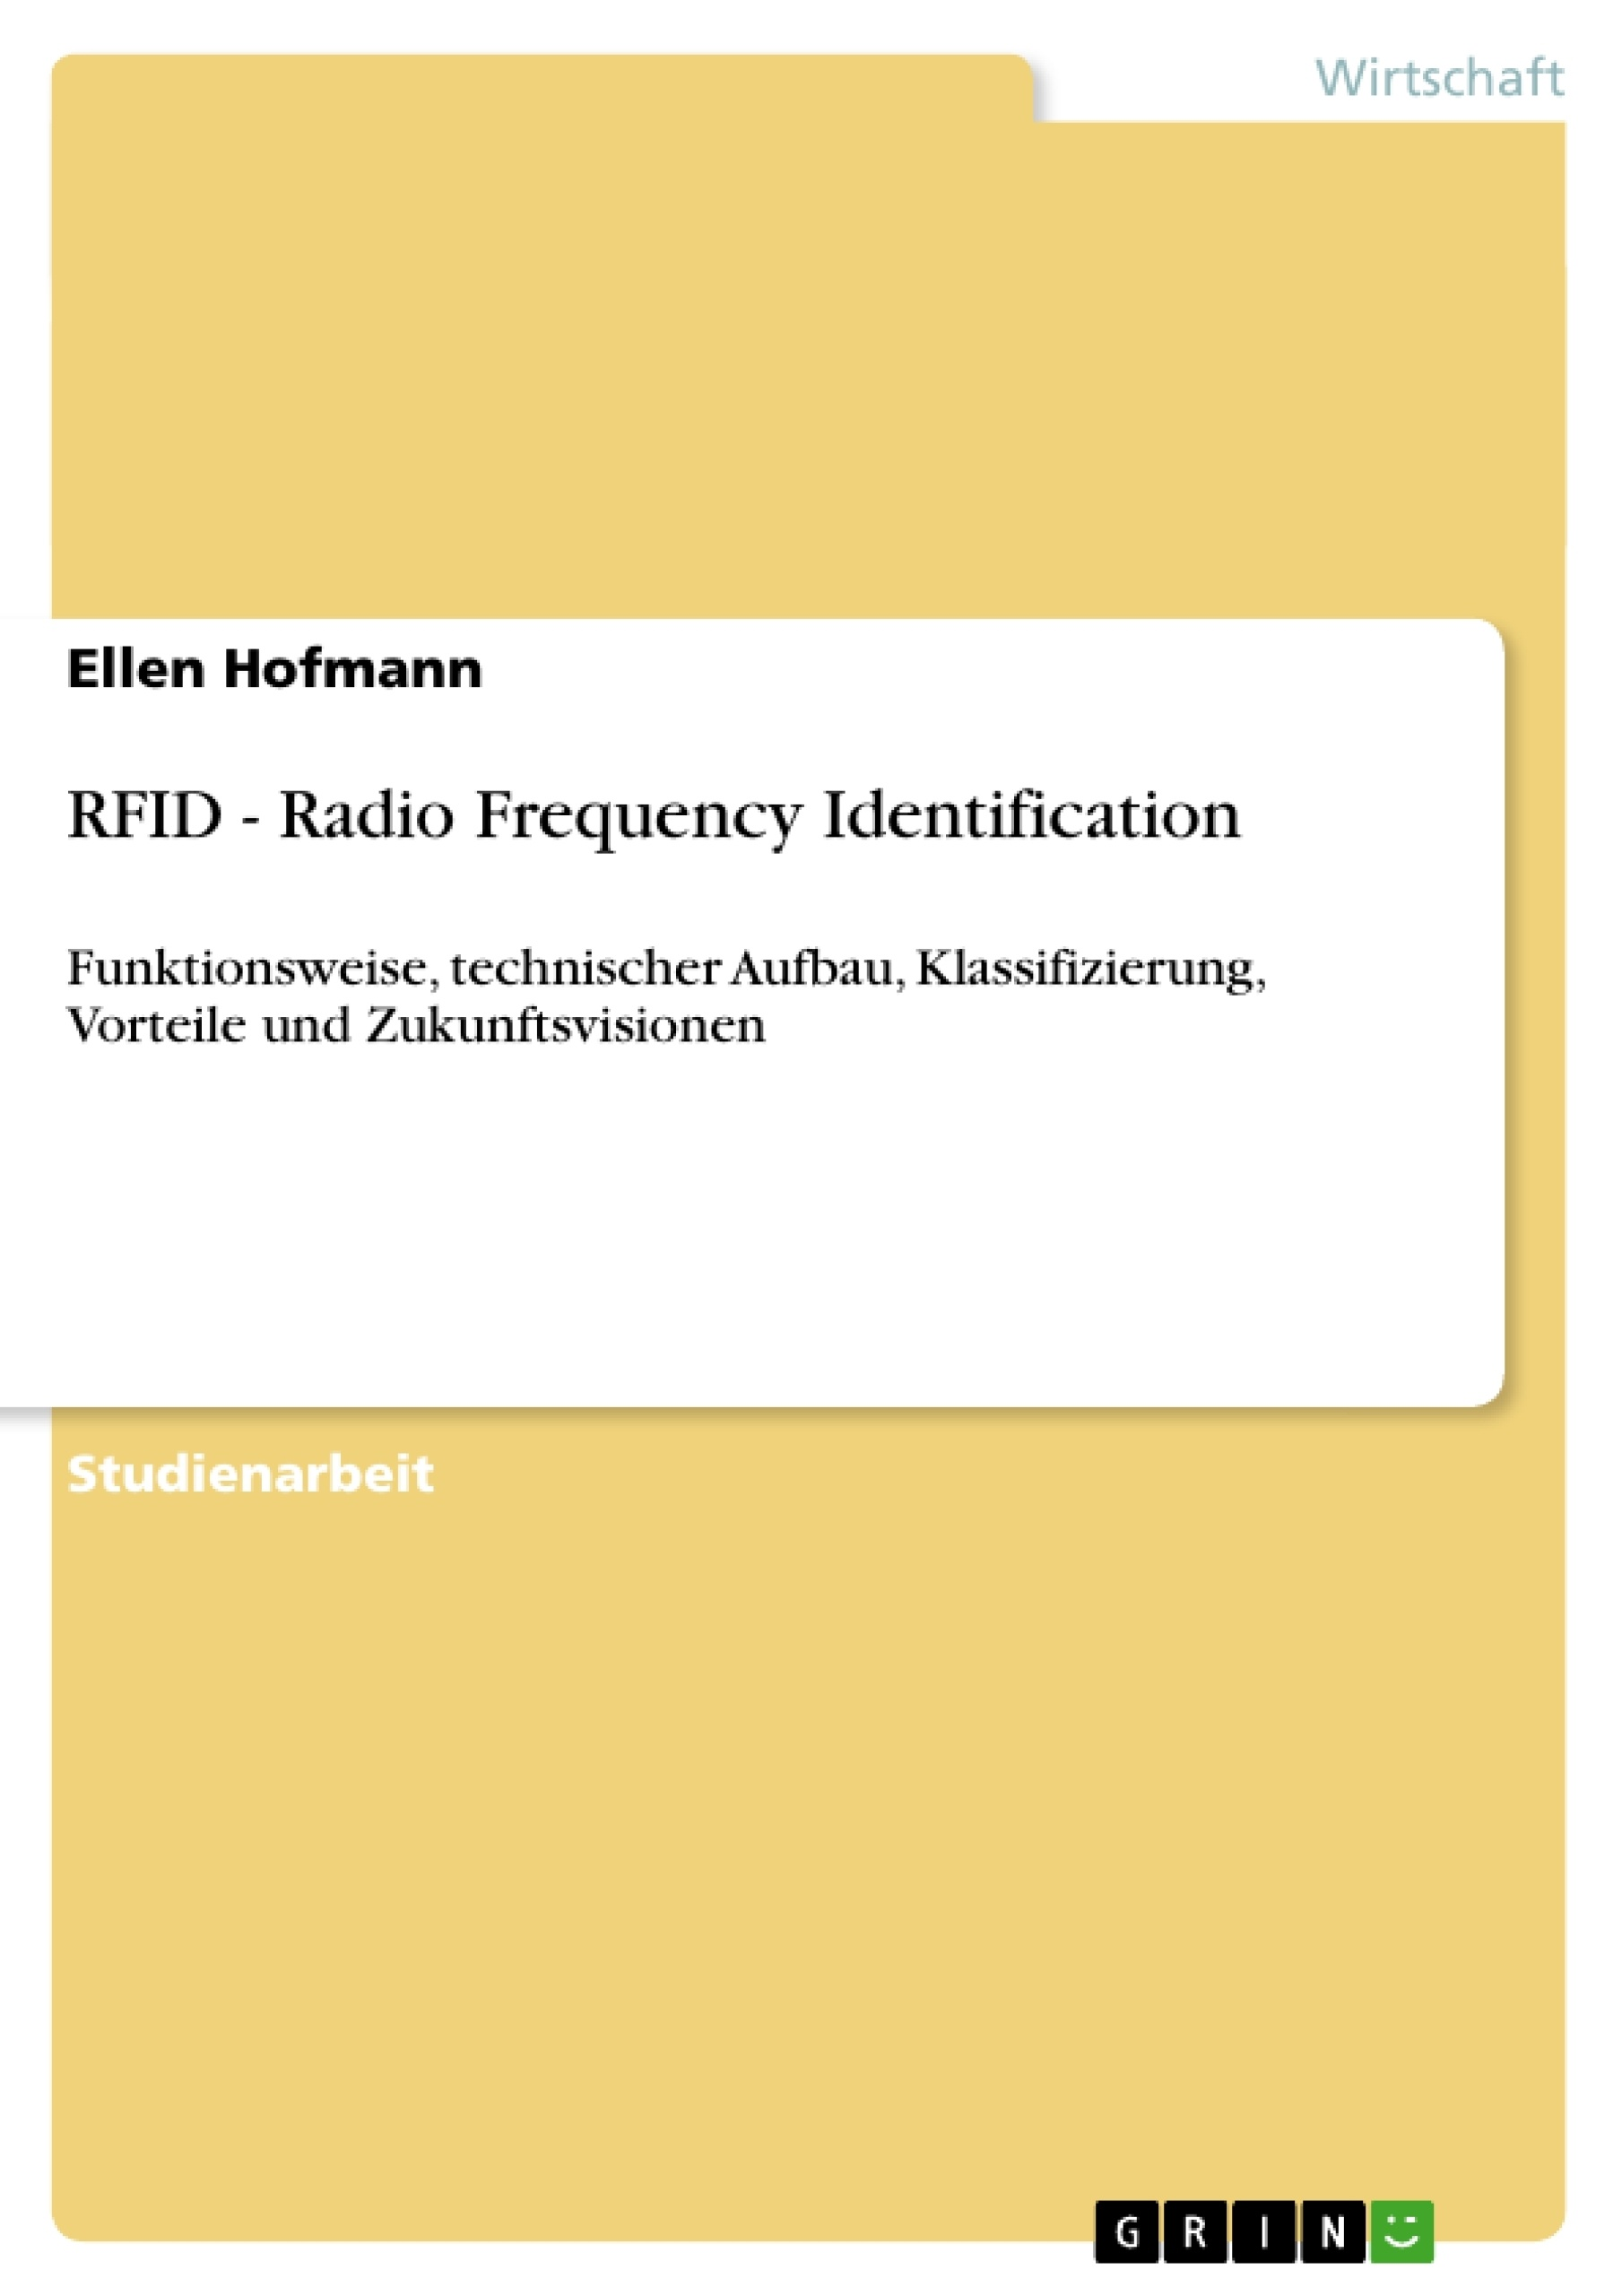 Titel: RFID - Radio Frequency Identification